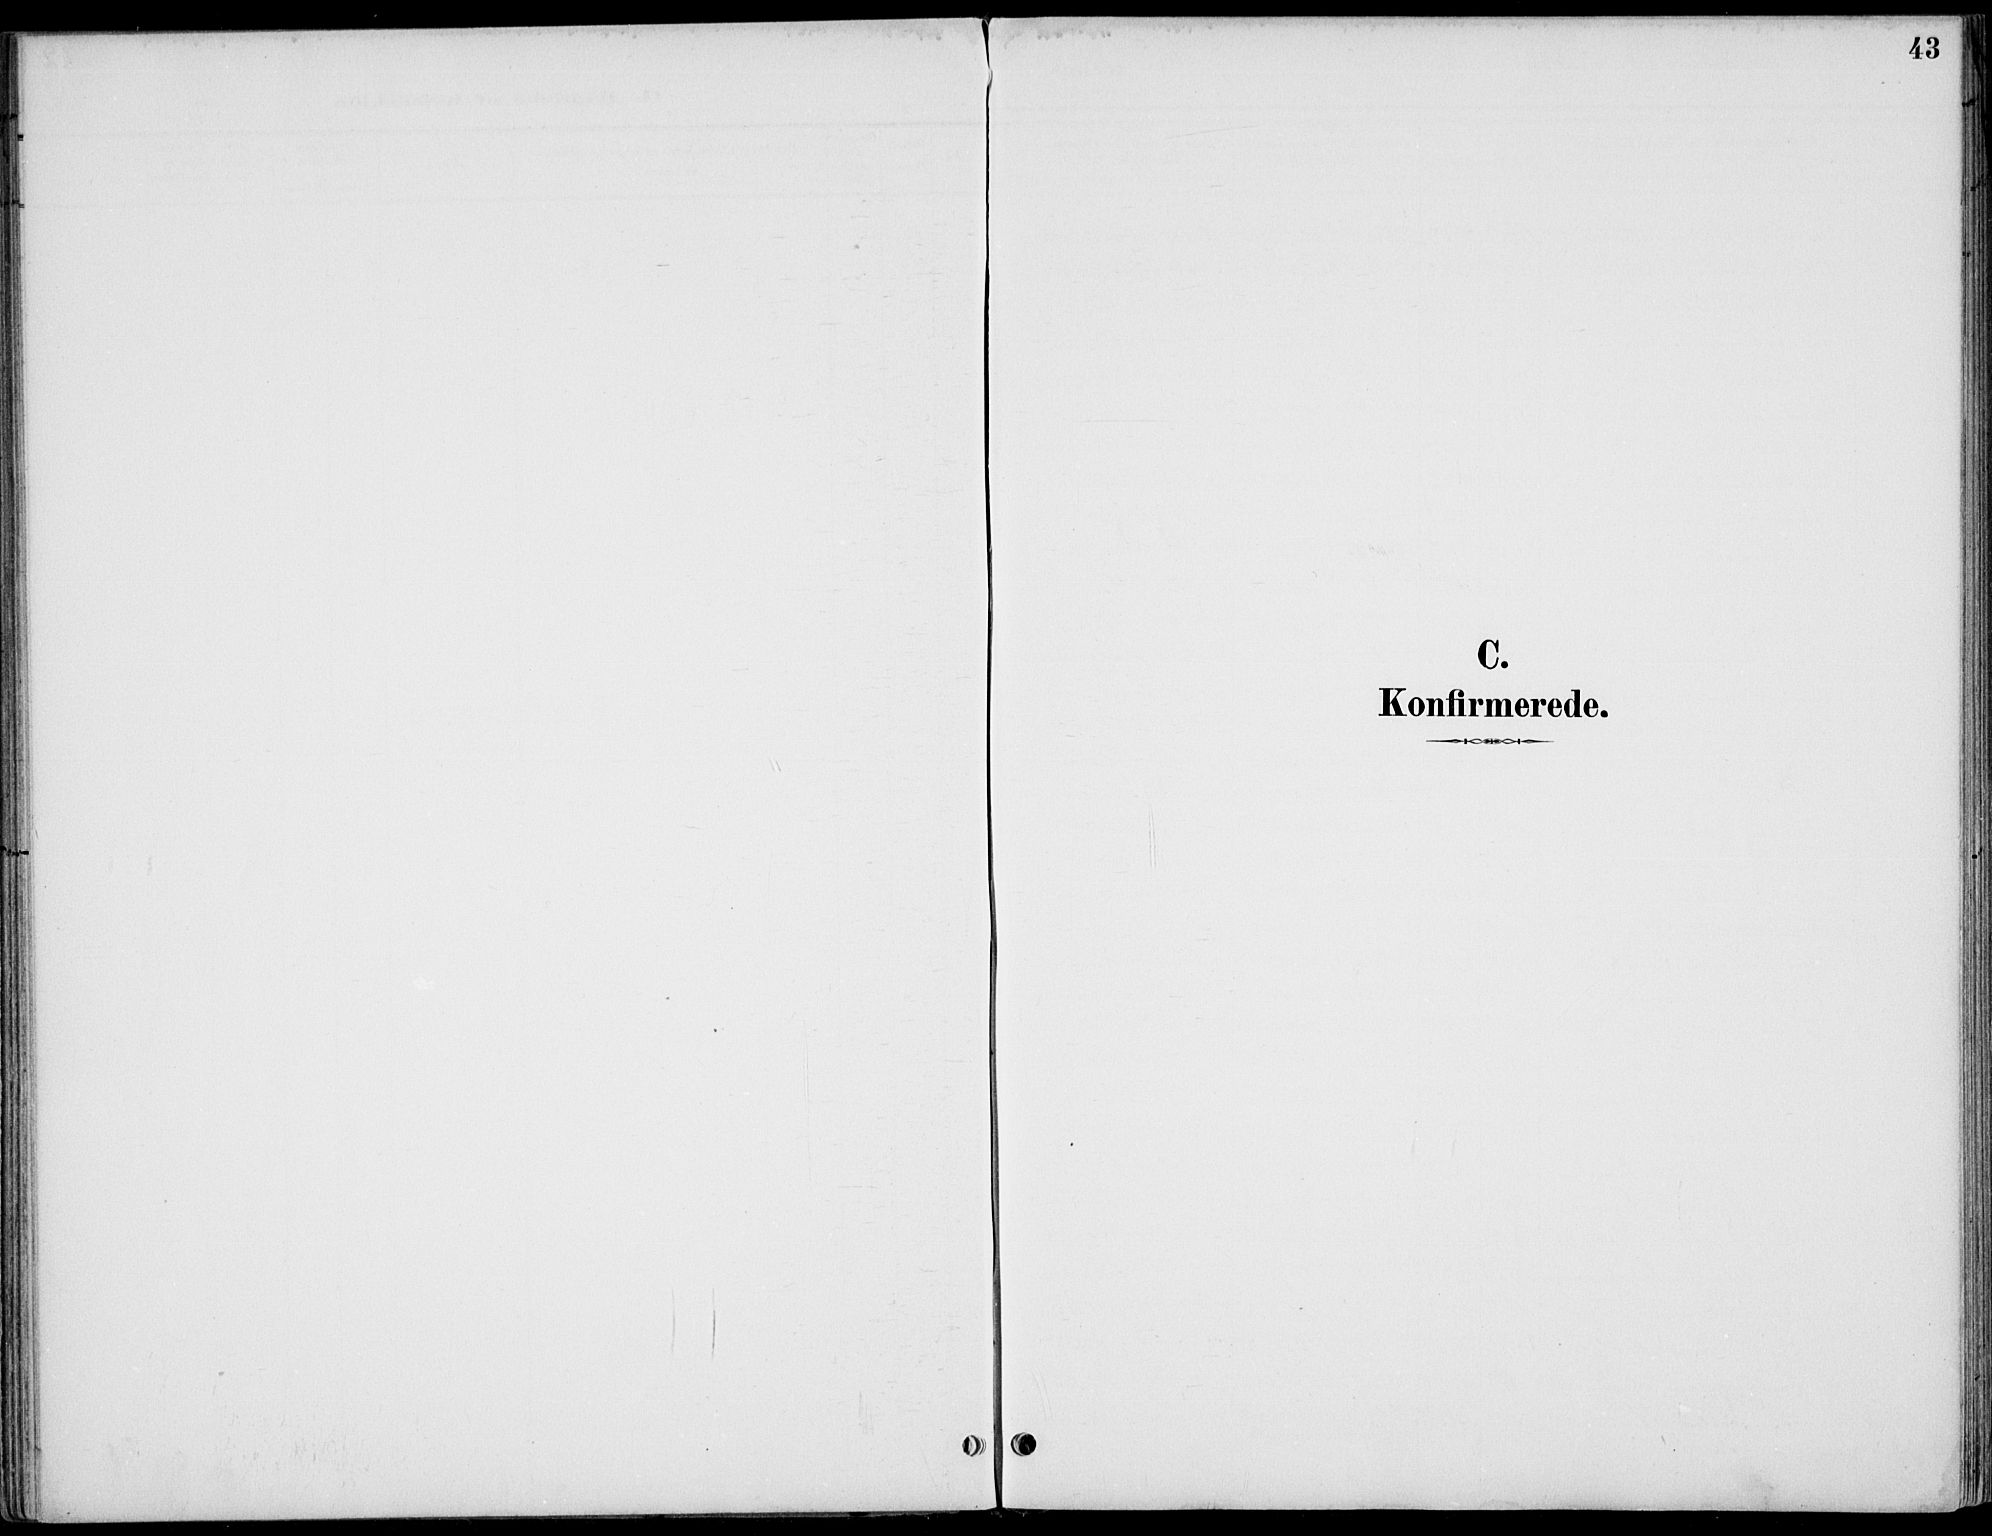 SAH, Østre Gausdal prestekontor, Ministerialbok nr. 3, 1887-1901, s. 43